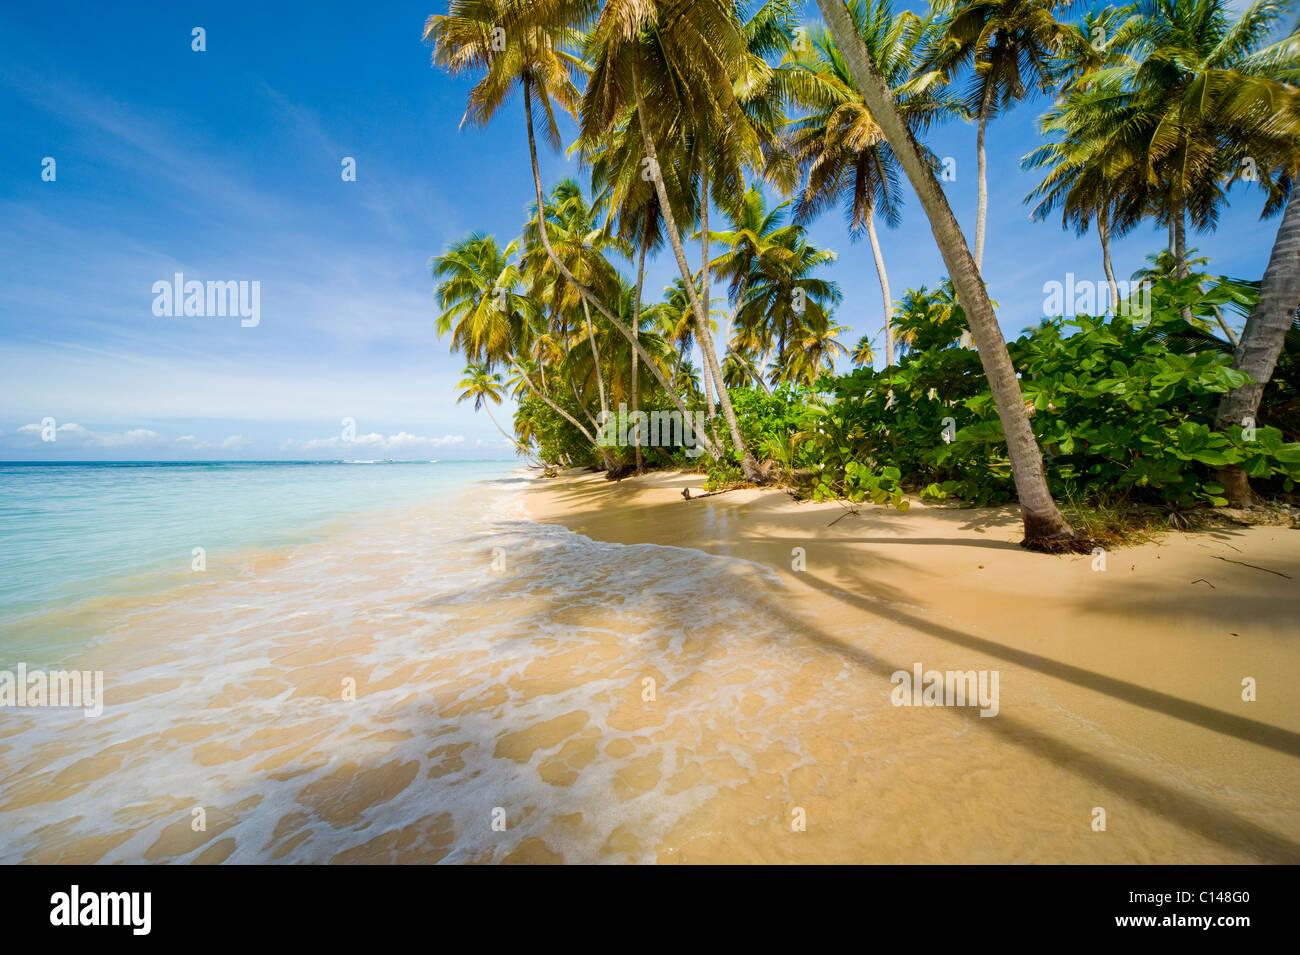 Caribbean beach, tropical. - Stock Image